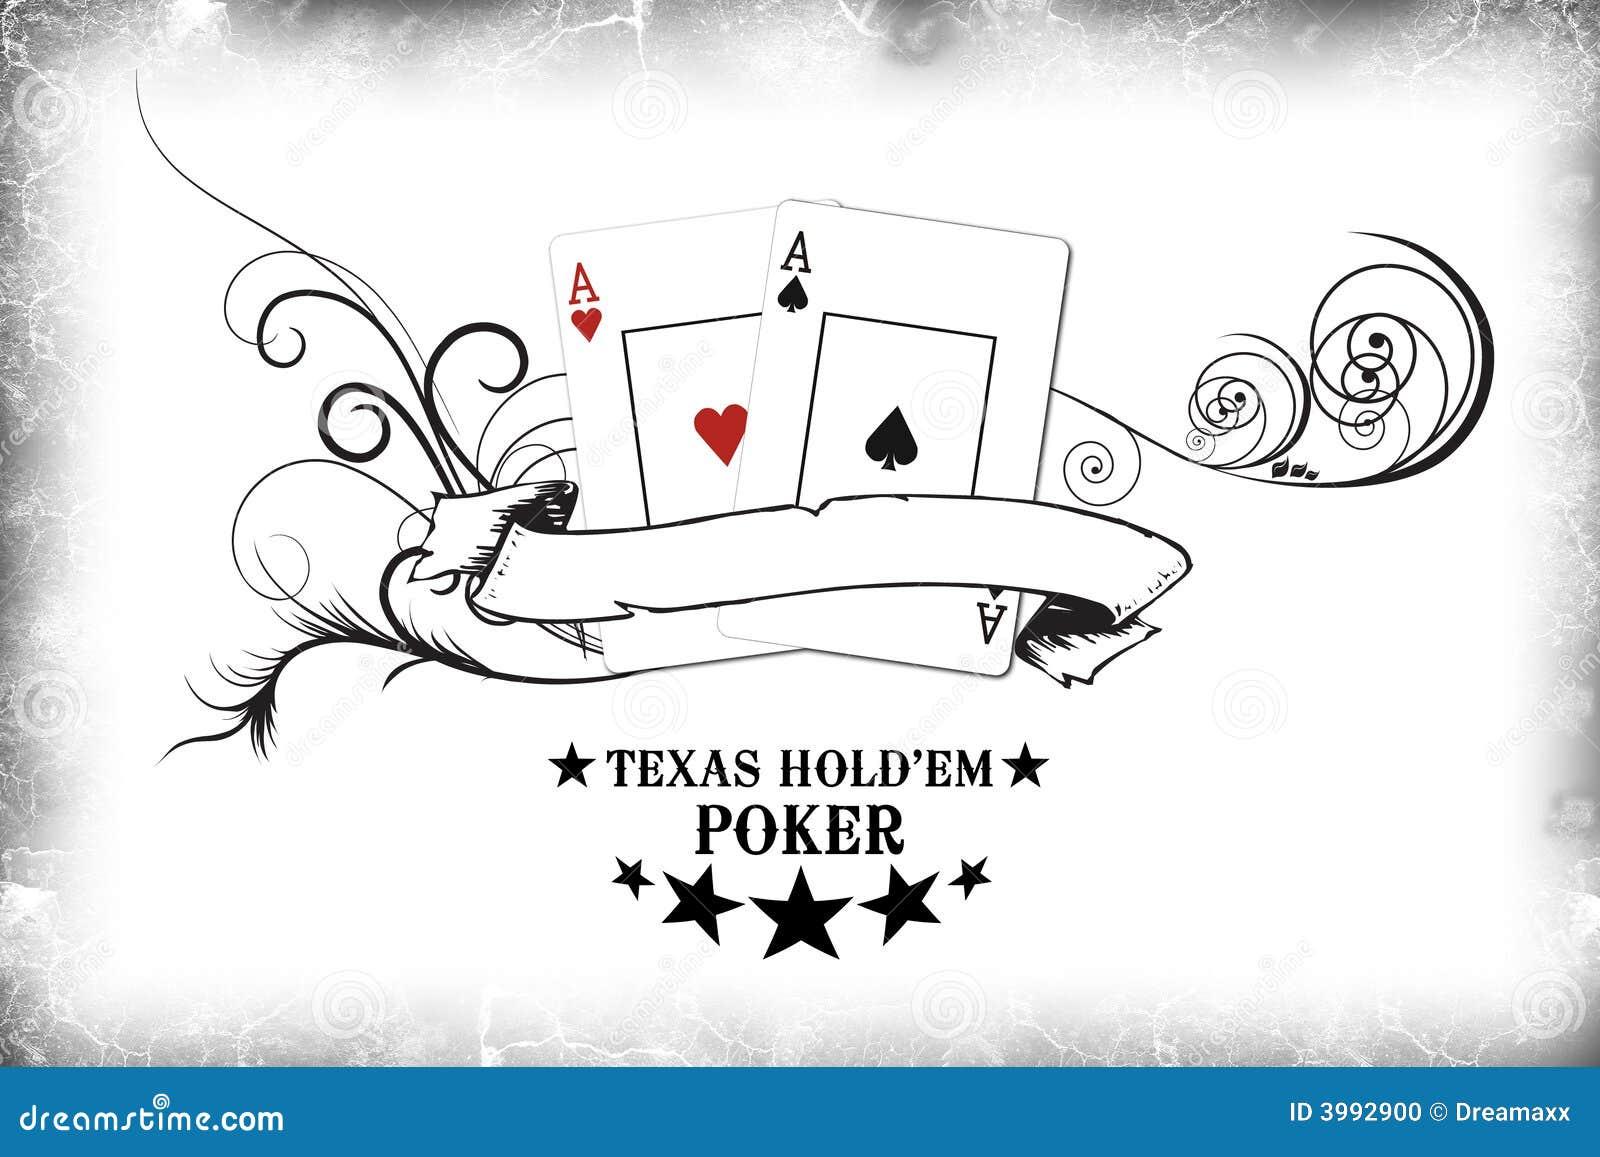 Póker - soy todo adentro